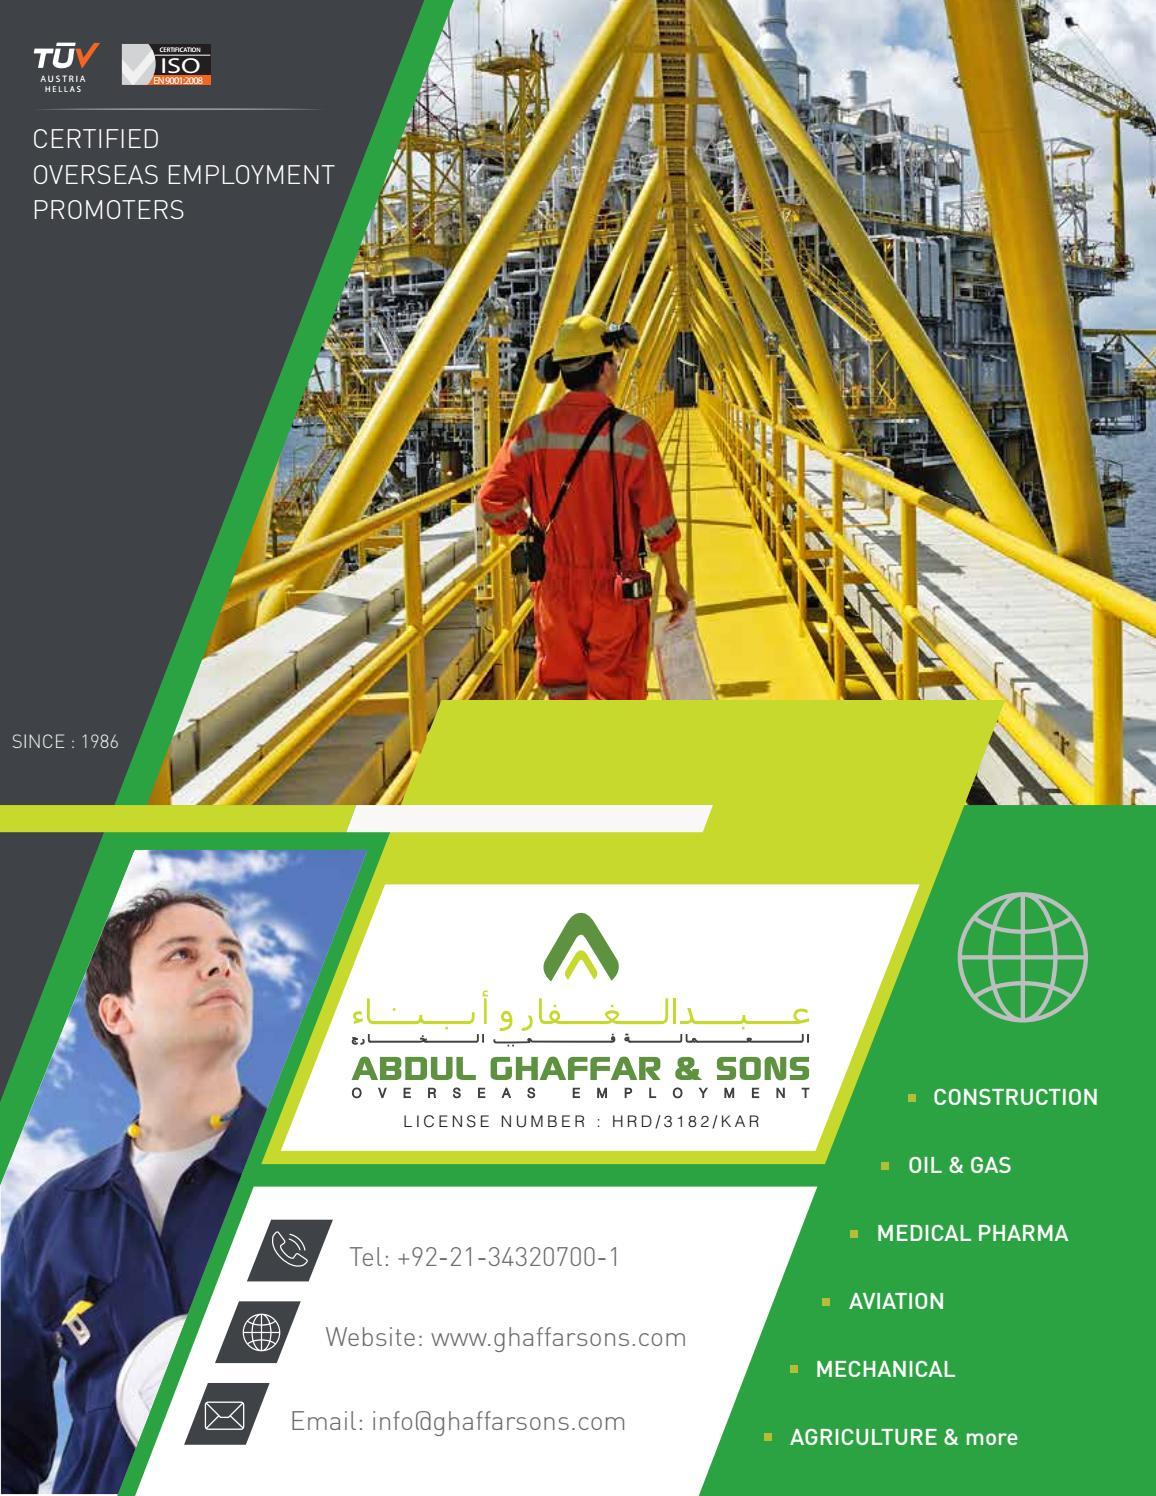 Ags overseas employment agencies in pakistan by Abdul Ghaffar and